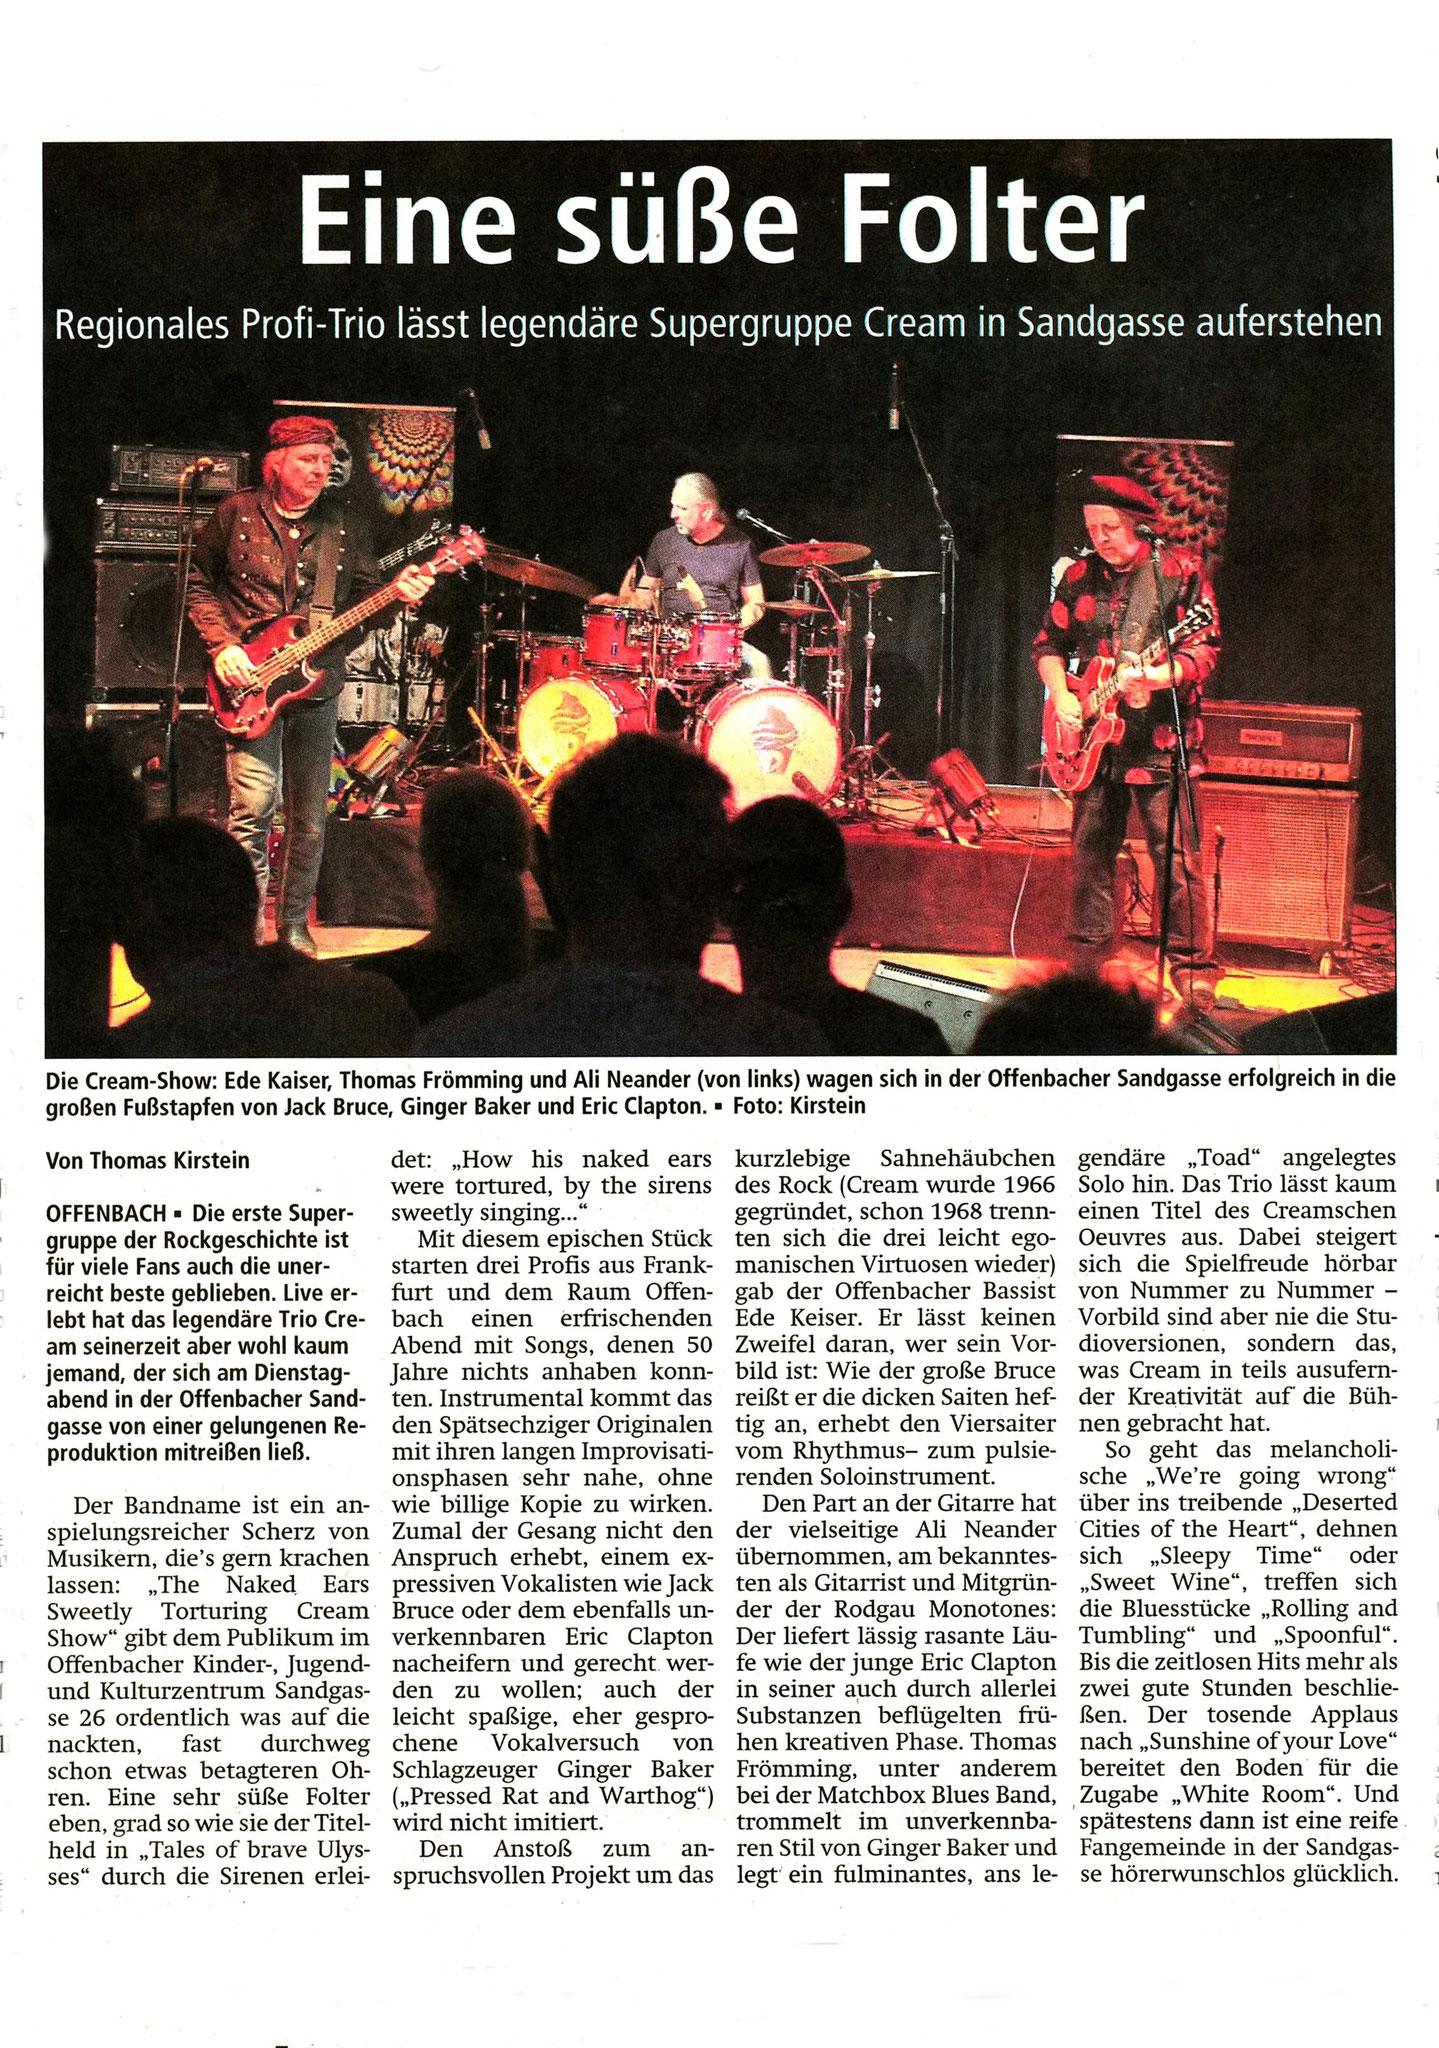 Offenbach Post, 25. Oktober 2018